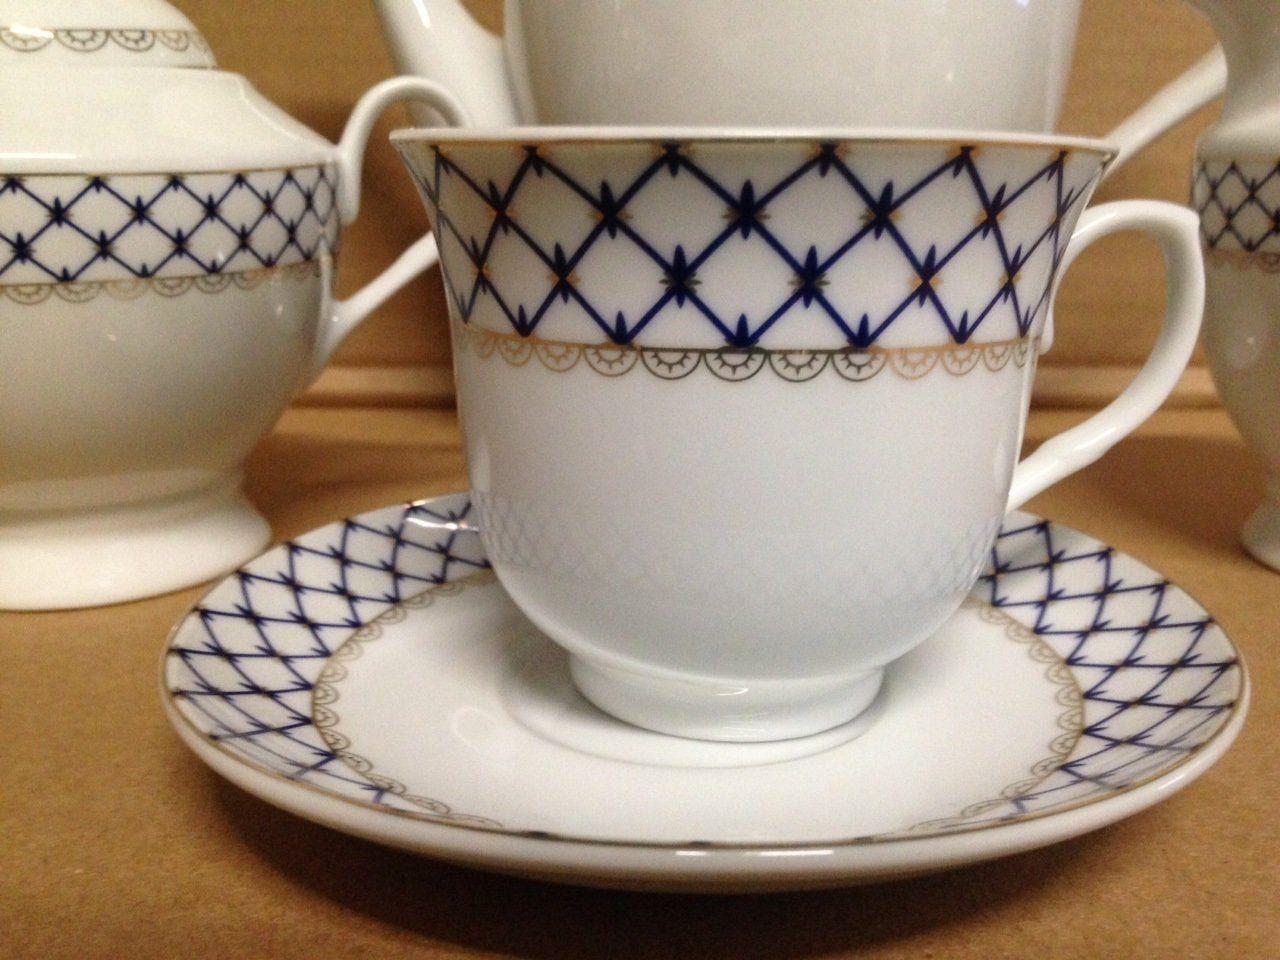 Set of 6 Cobalt Net Wholesale Tea Cups and Saucers - 2 Sets Left ...